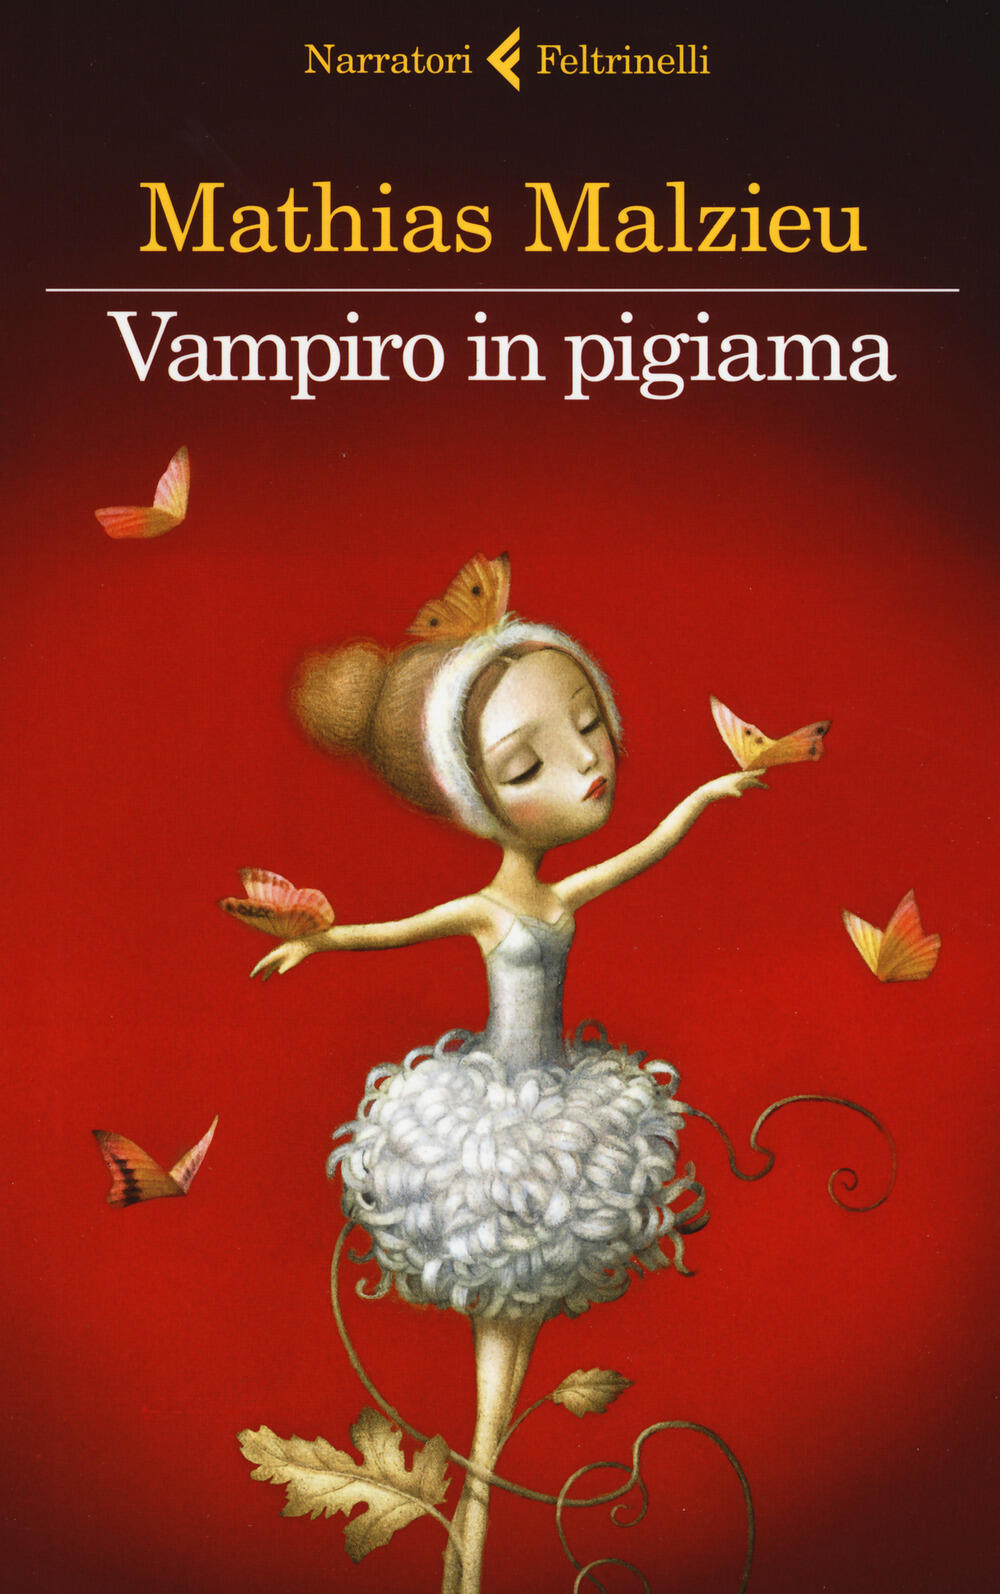 Vampiro In Pigiama  Mathias Malzieu  Libro  Feltrinelli  I Narratori   Ibs